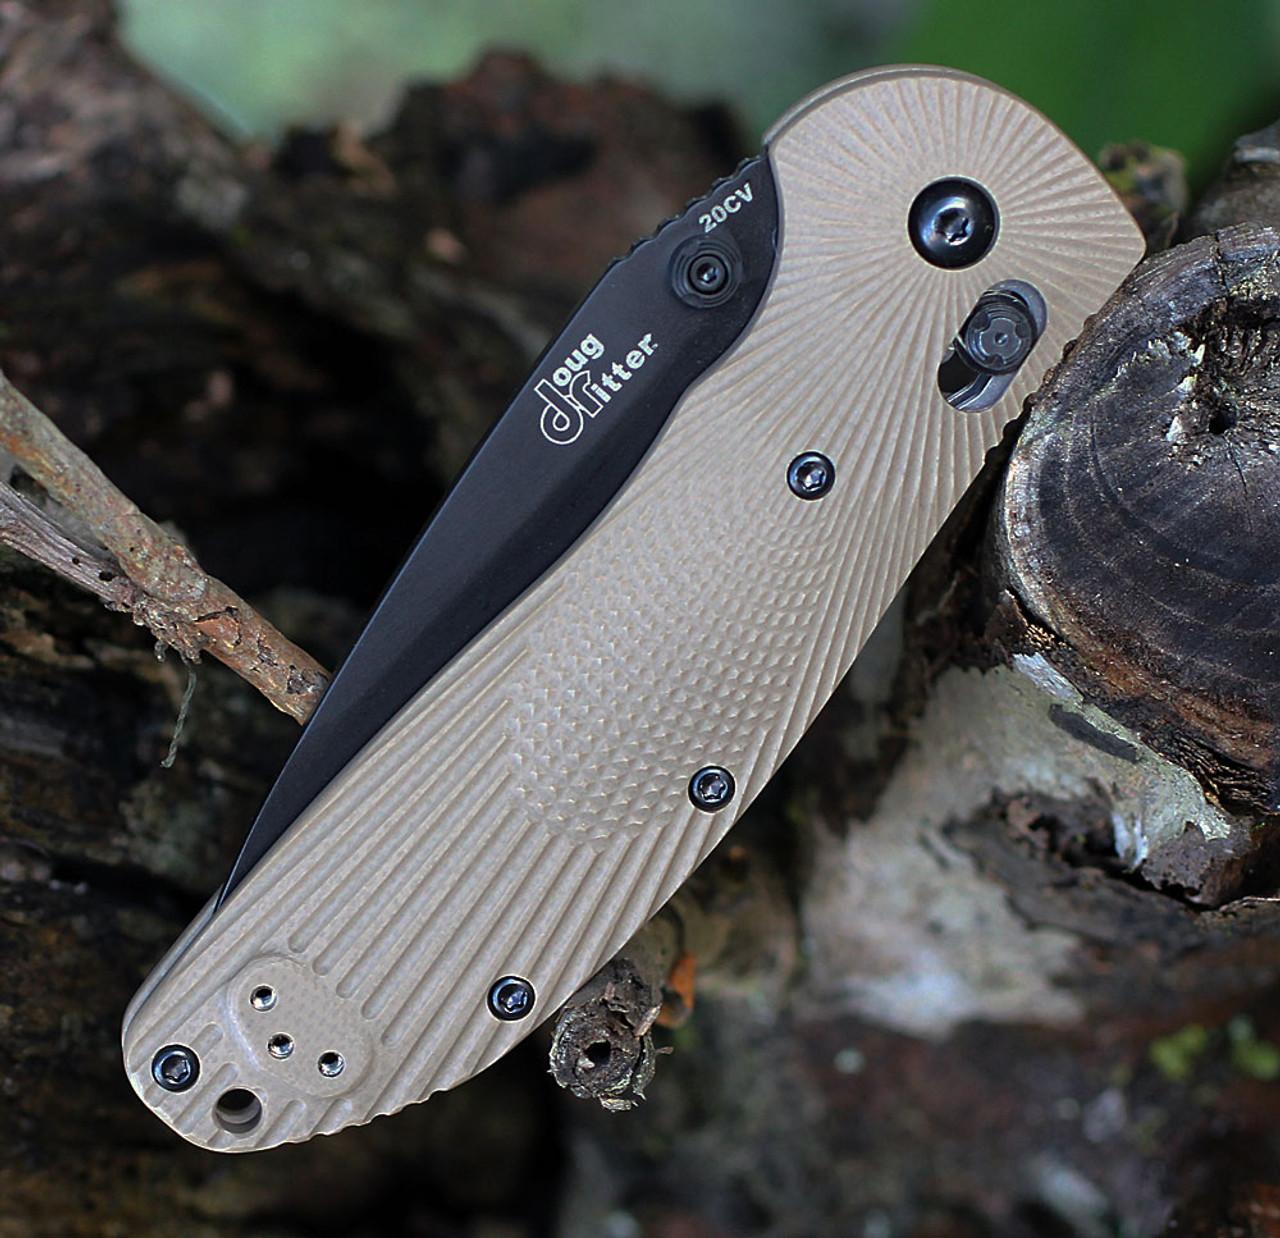 Doug Ritter RSK® MK1-G2 Knifeworks Exclusive - Flat Dark Earth/ Black, DR54183